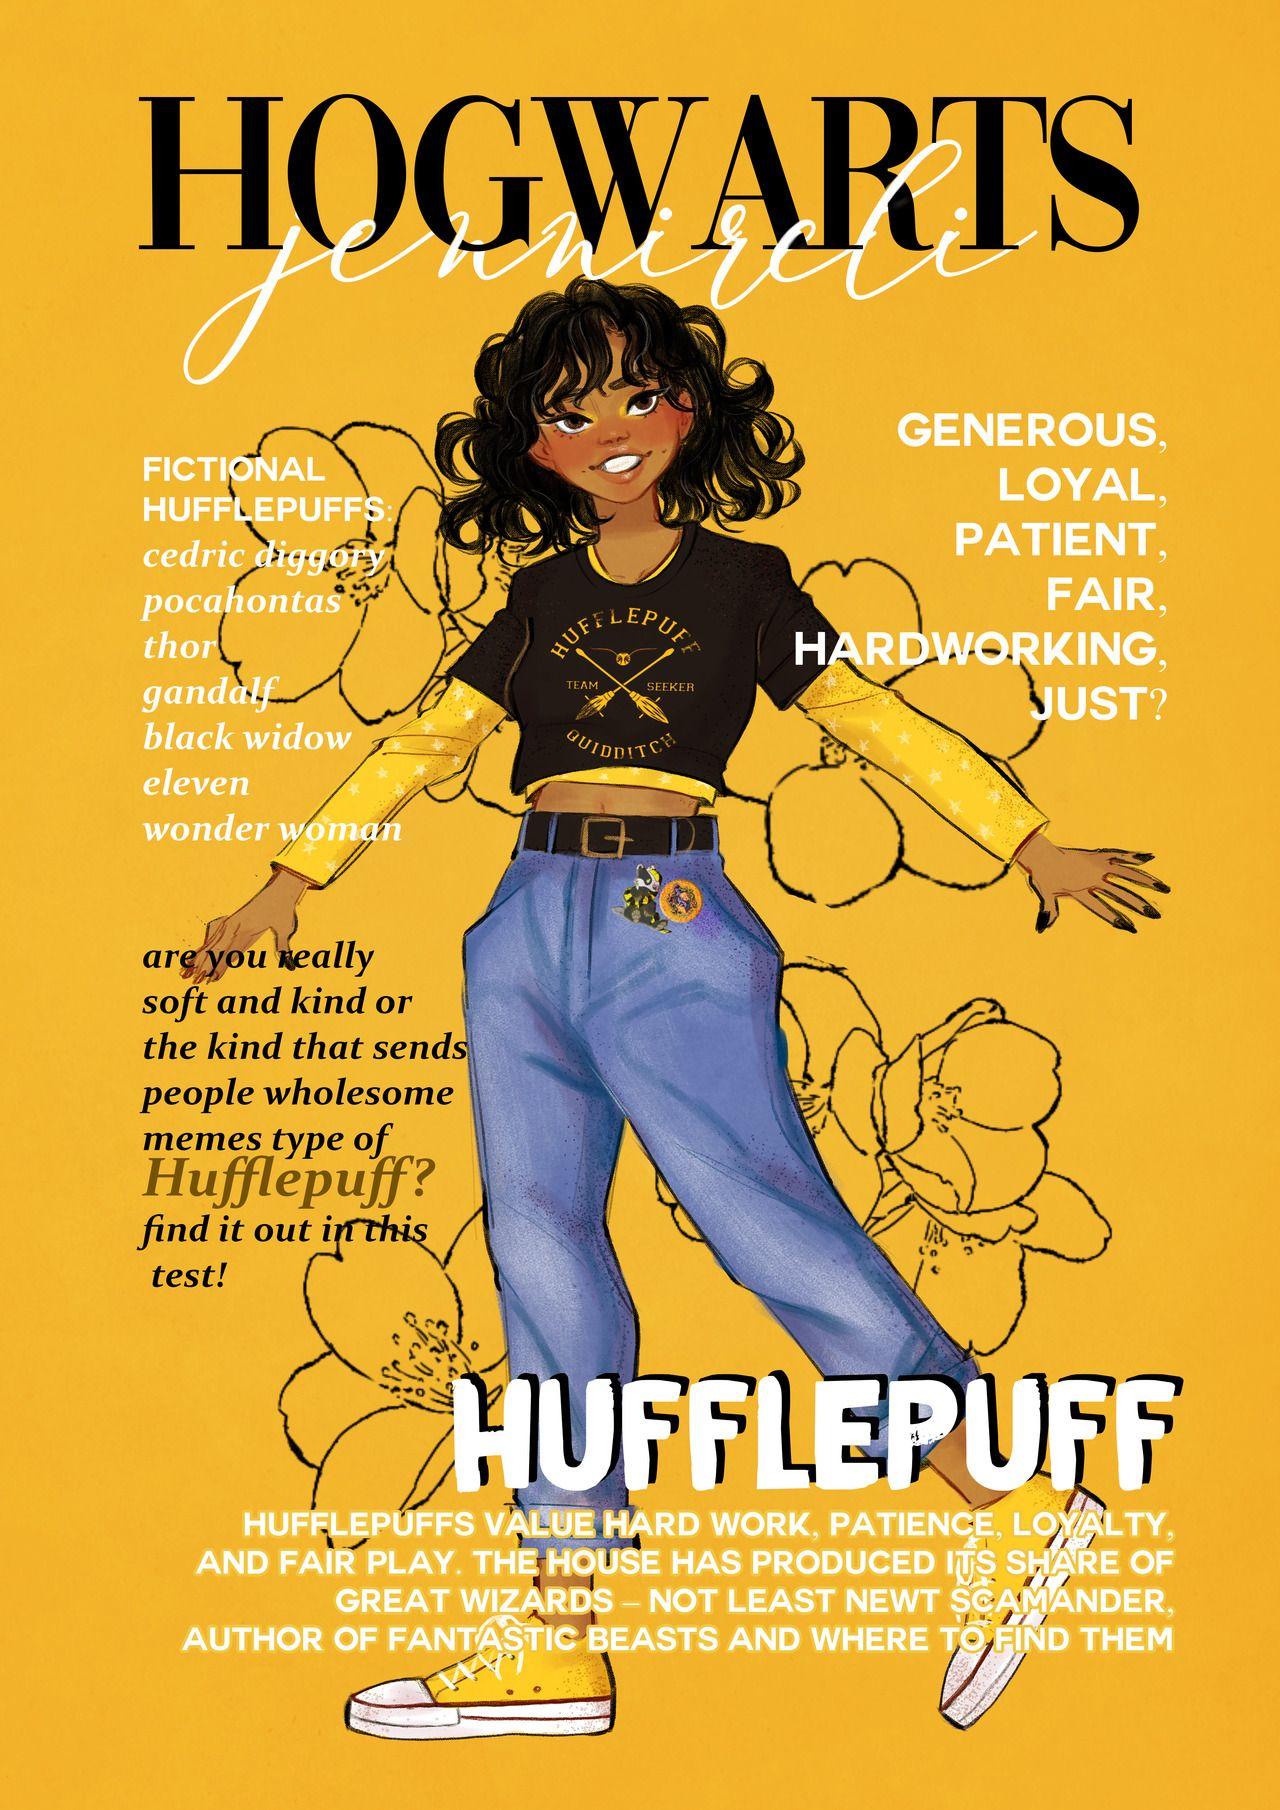 Jennireli Hogwarts Magazine Covers Instagram Harry Potter Drawings Harry Potter Images Harry Potter Tumblr